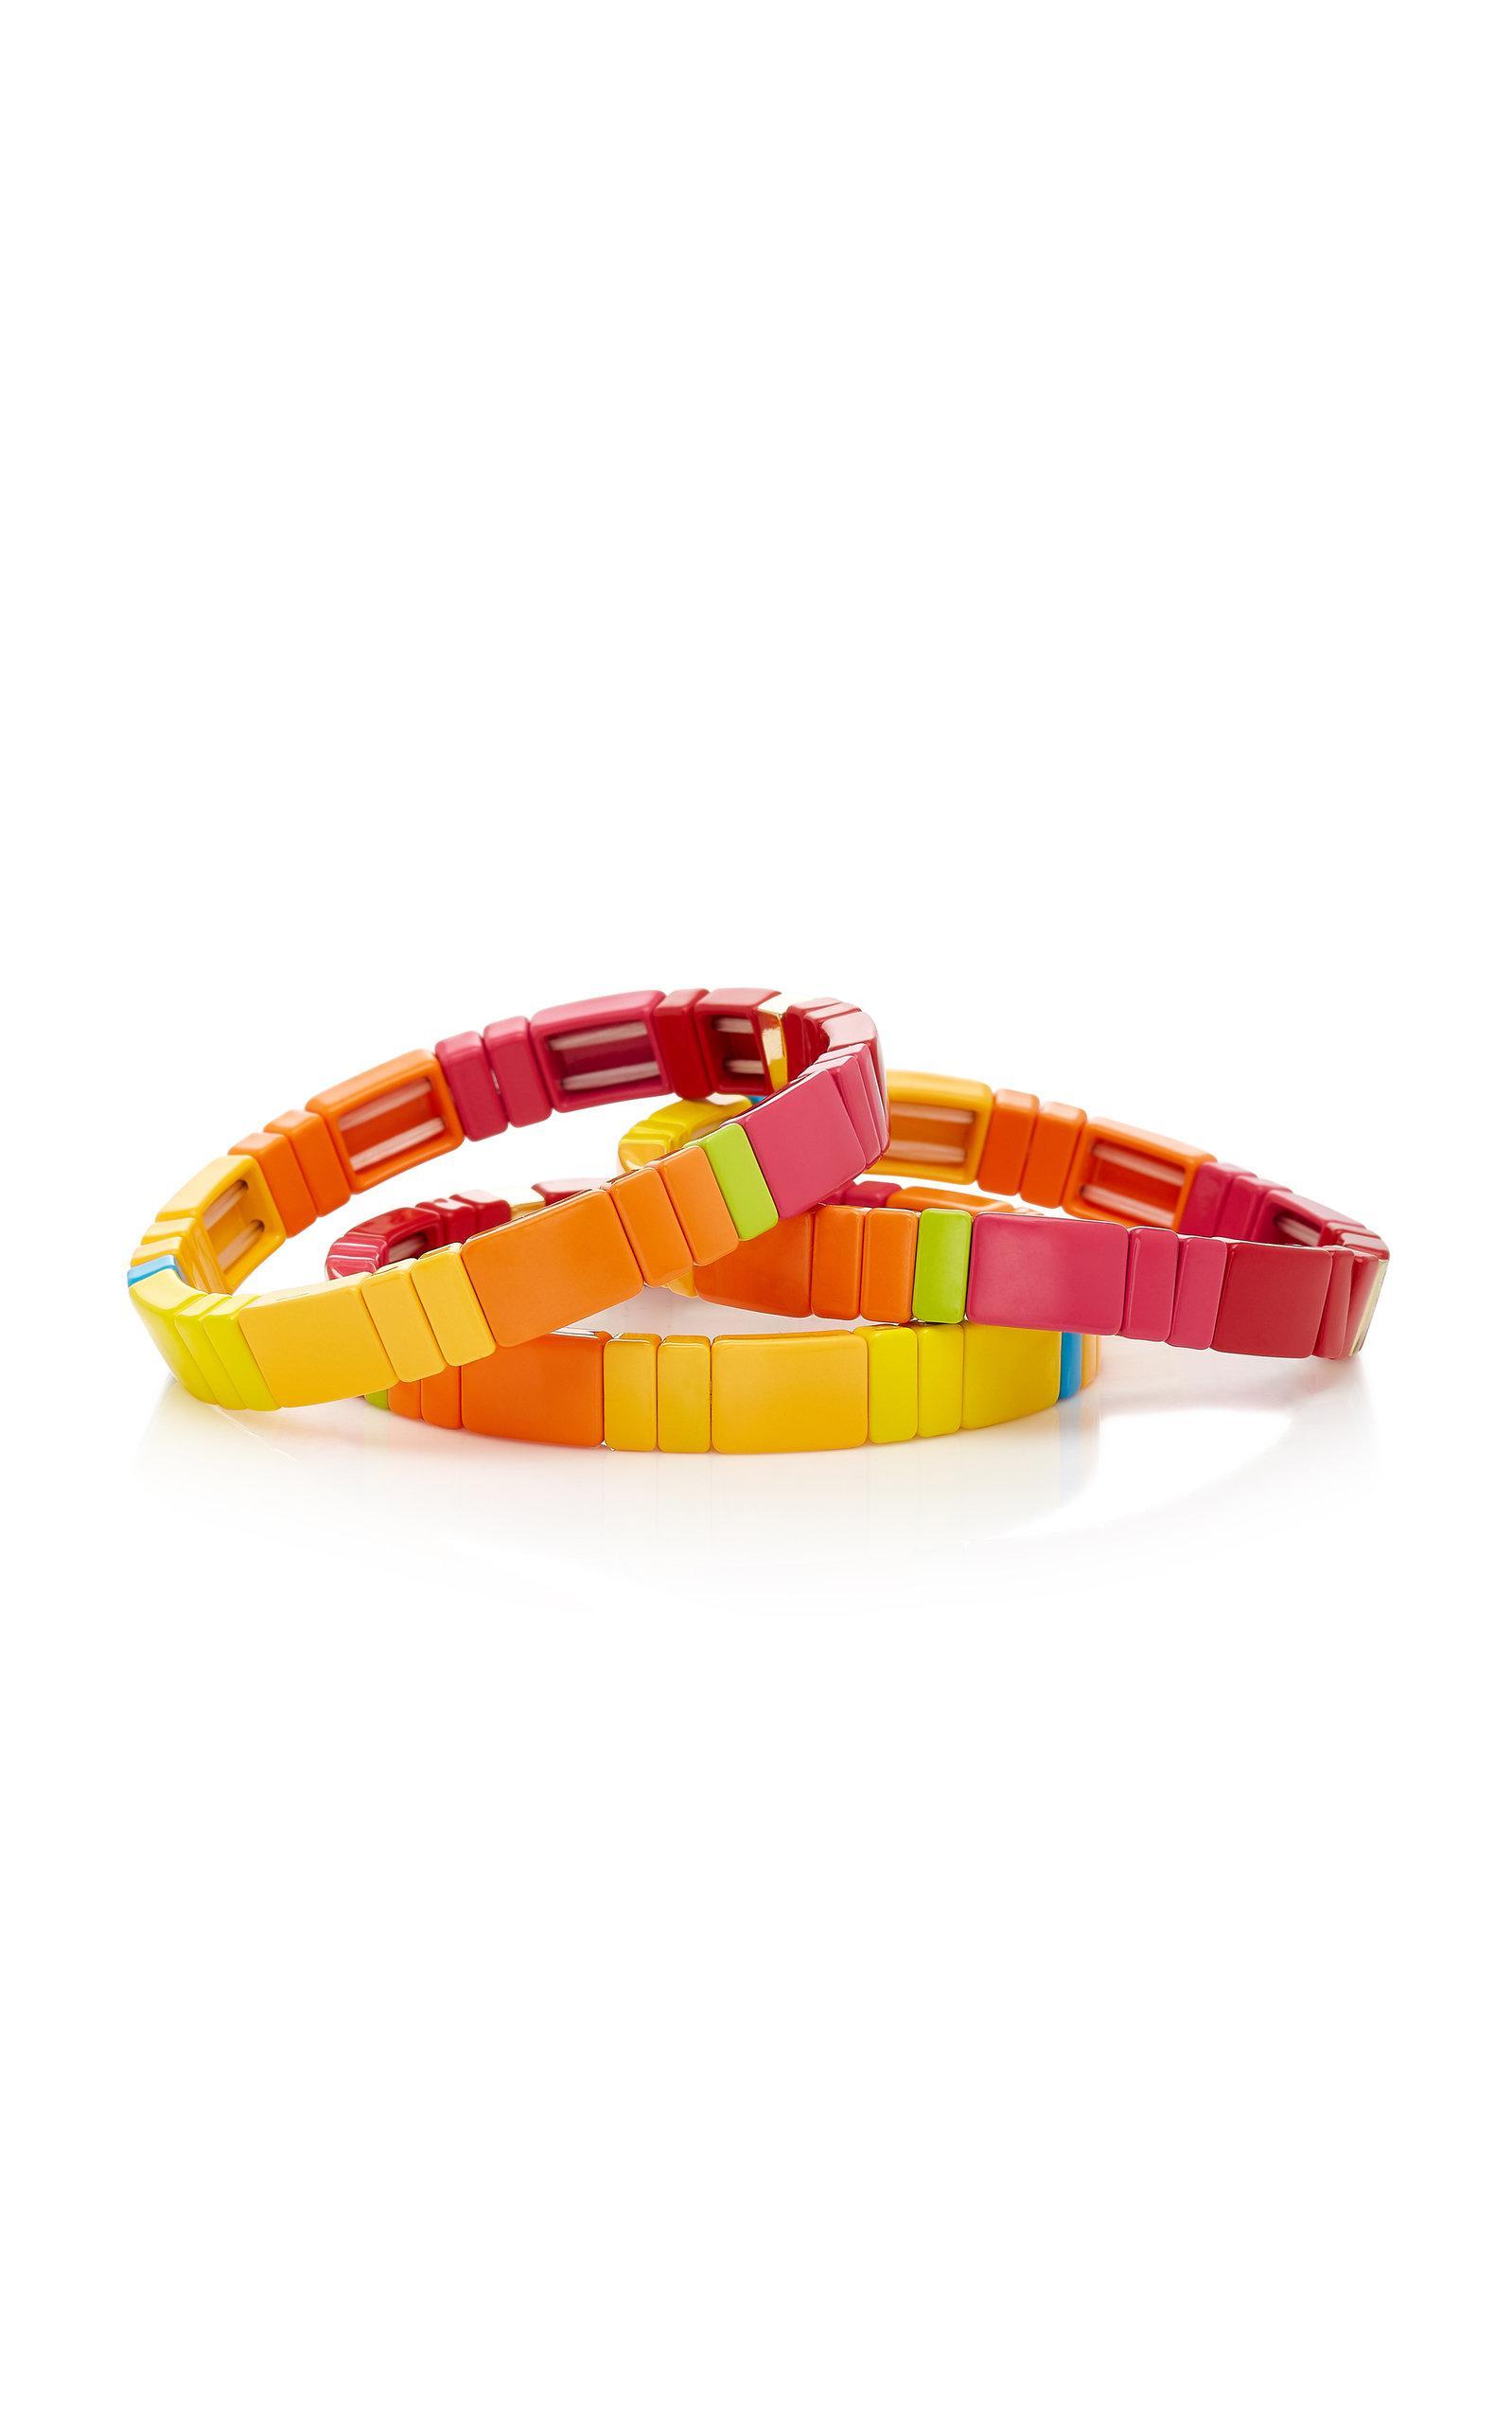 Roxanne Assoulin Set of Three Starburst Block Party Enamel Bracelets n6Kq5C